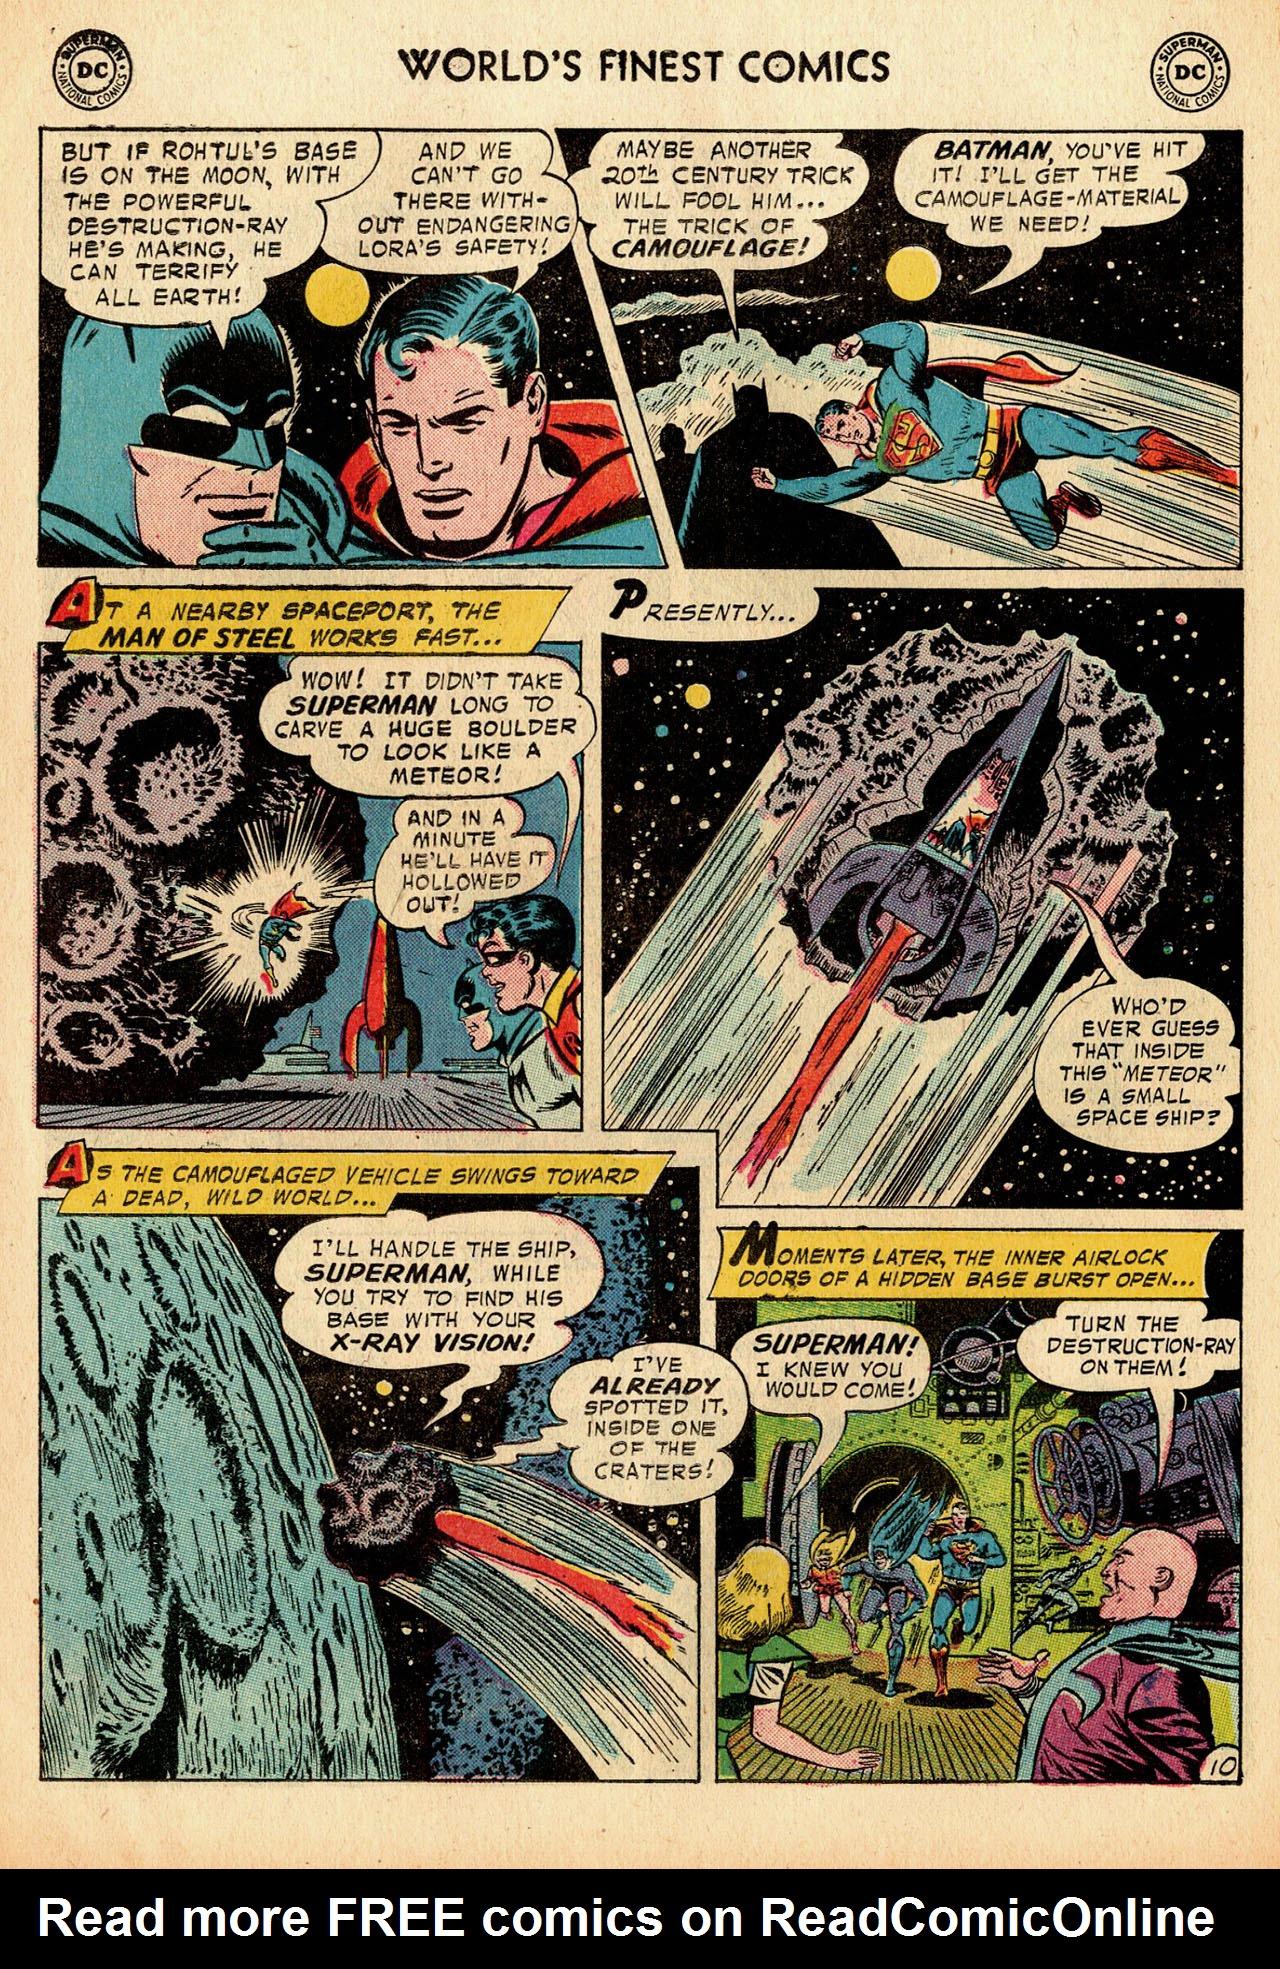 Read online World's Finest Comics comic -  Issue #91 - 12